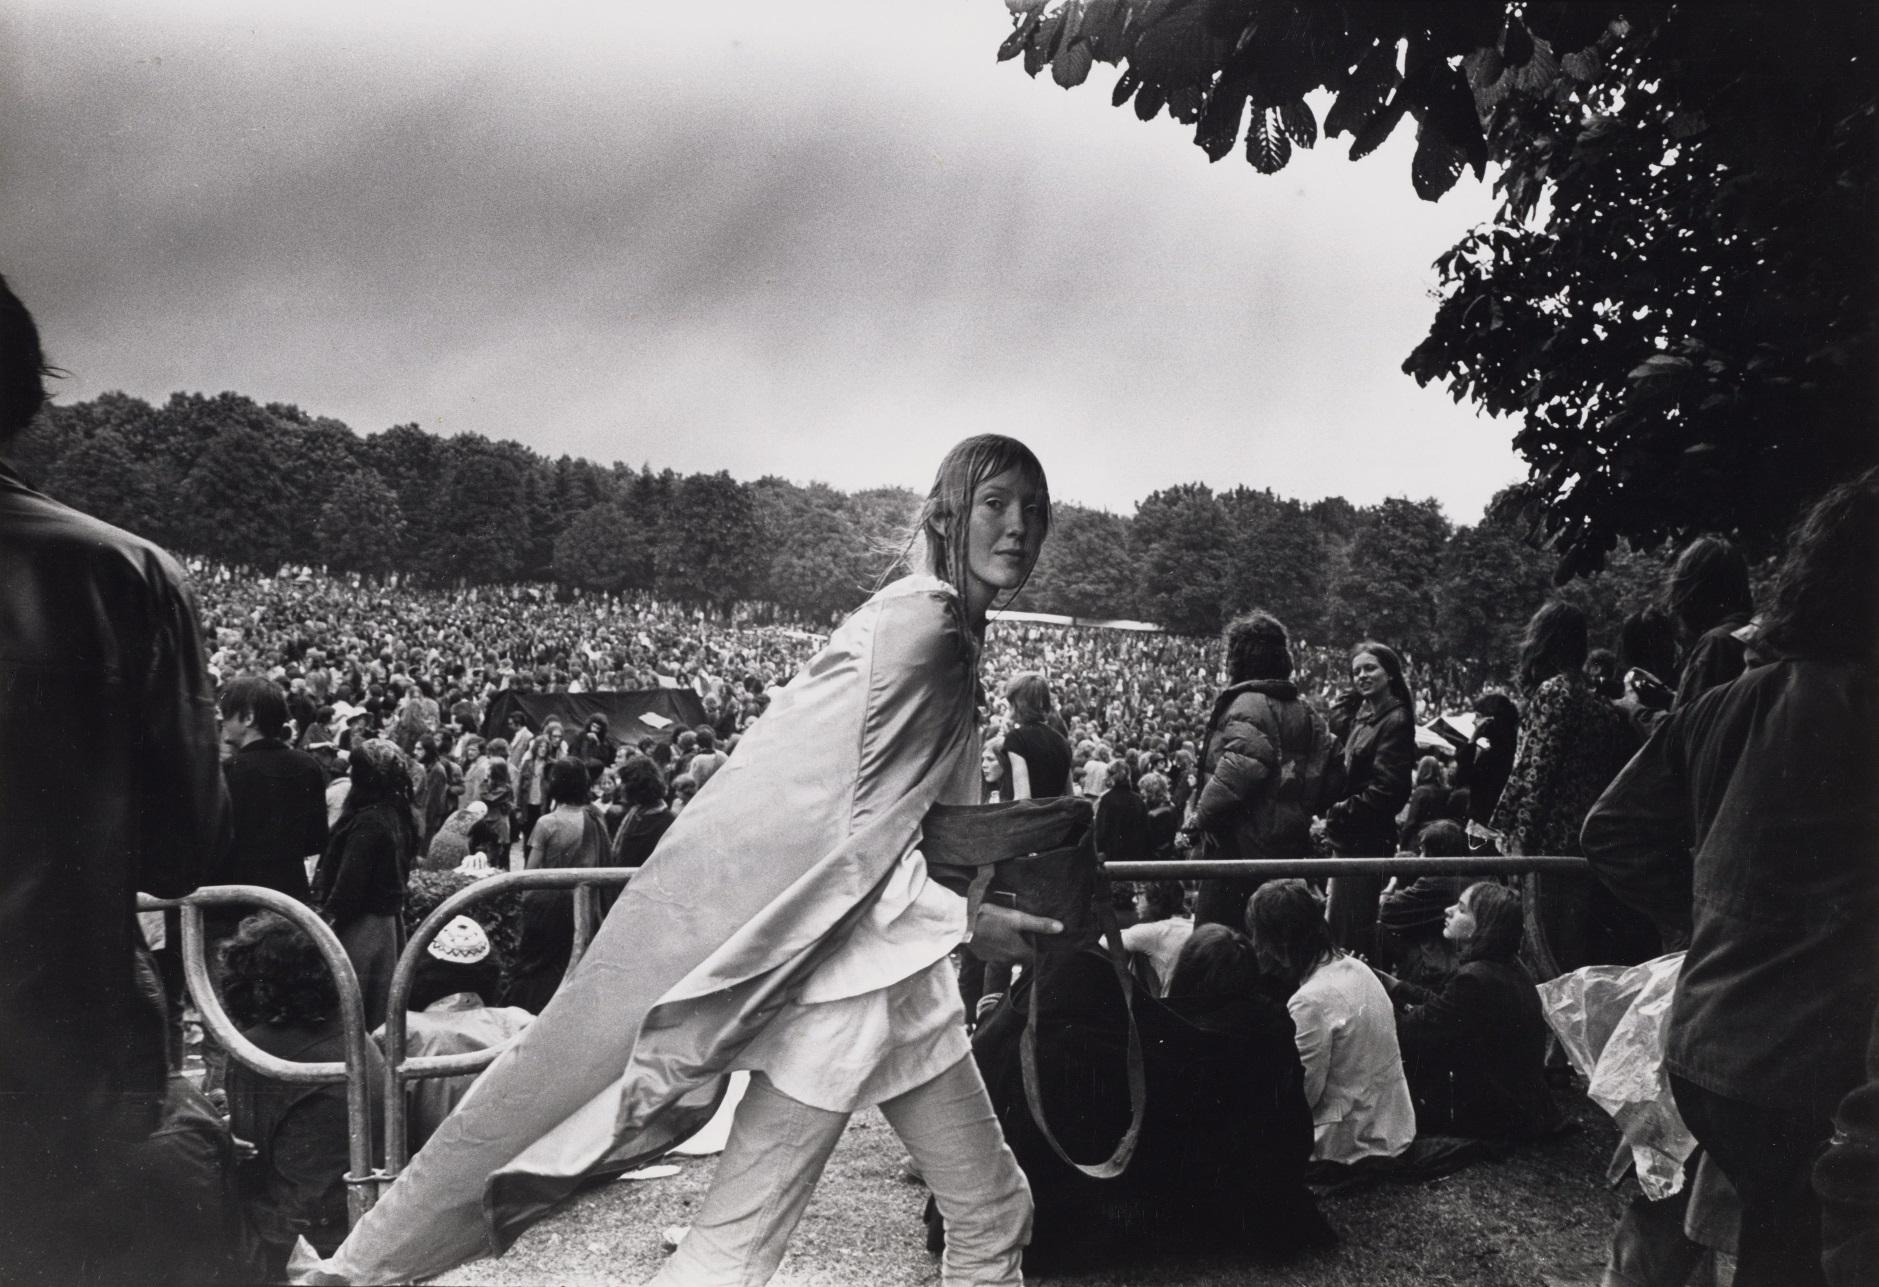 Foto:Dolf Toussaint  Popfestival in het Amsterdamse Bos, 26 juni 1971